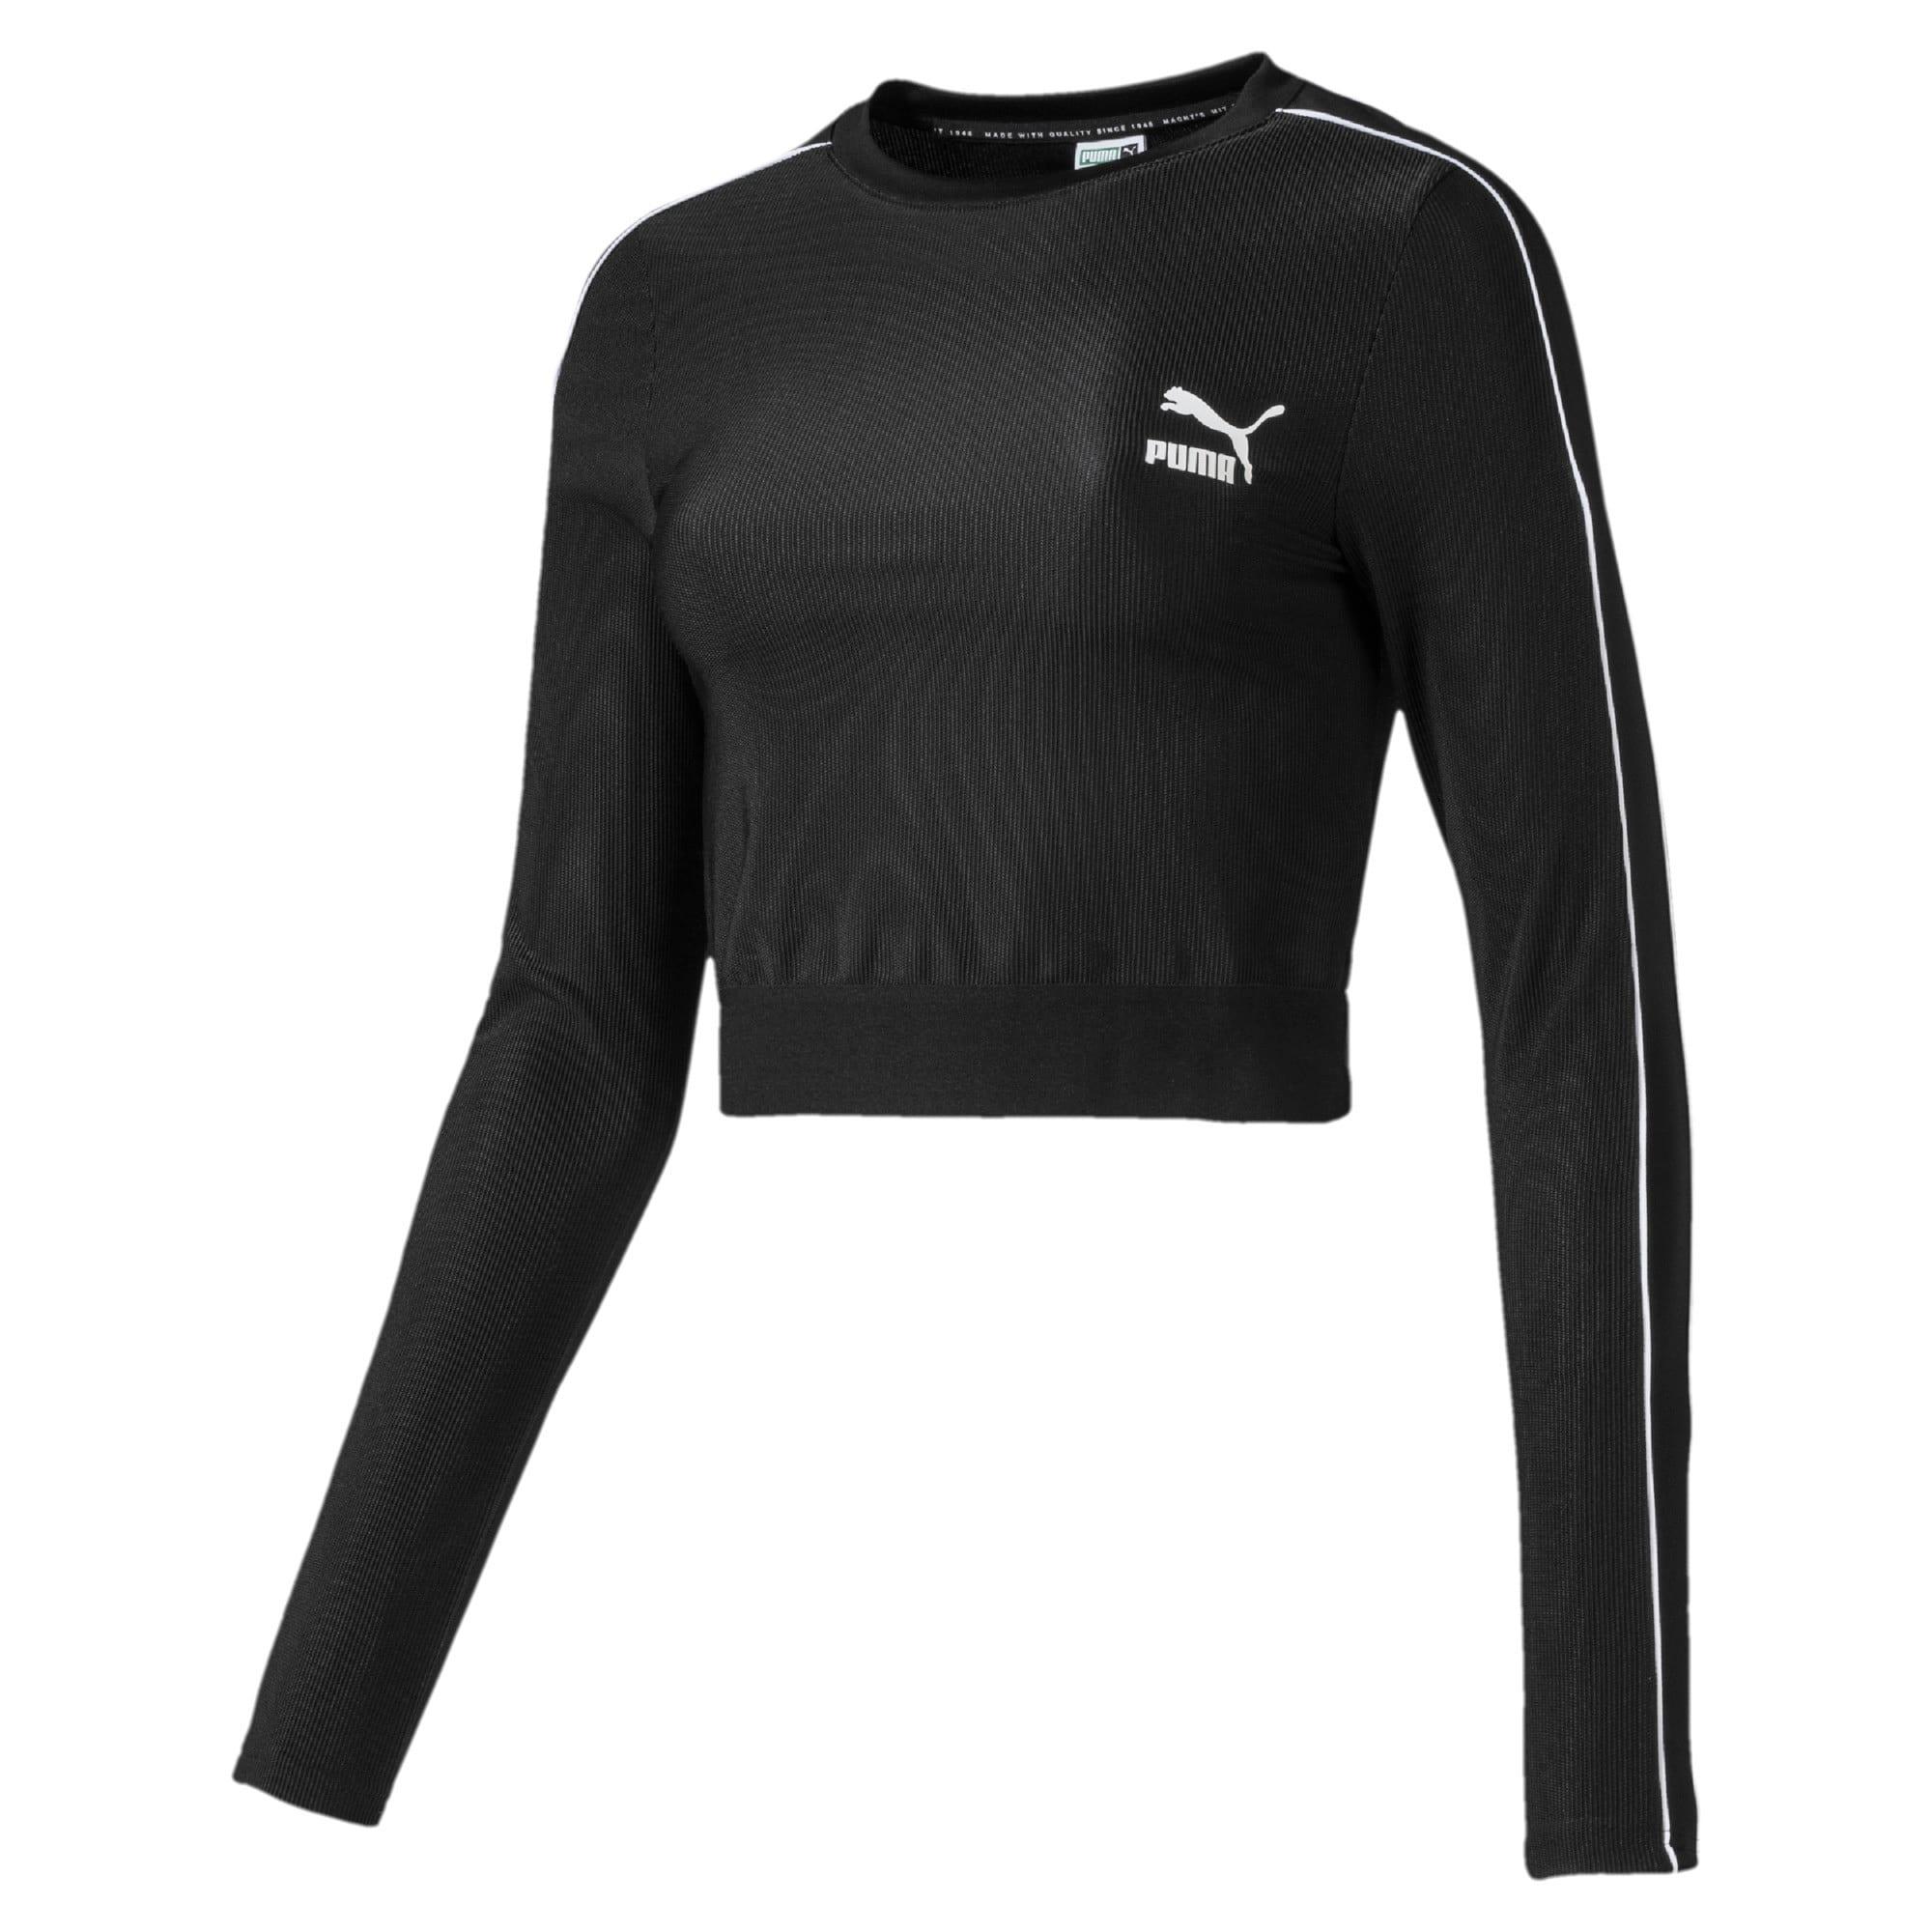 Thumbnail 4 of Classics Rib Cropped Long Sleeve Women's Top, Puma Black, medium